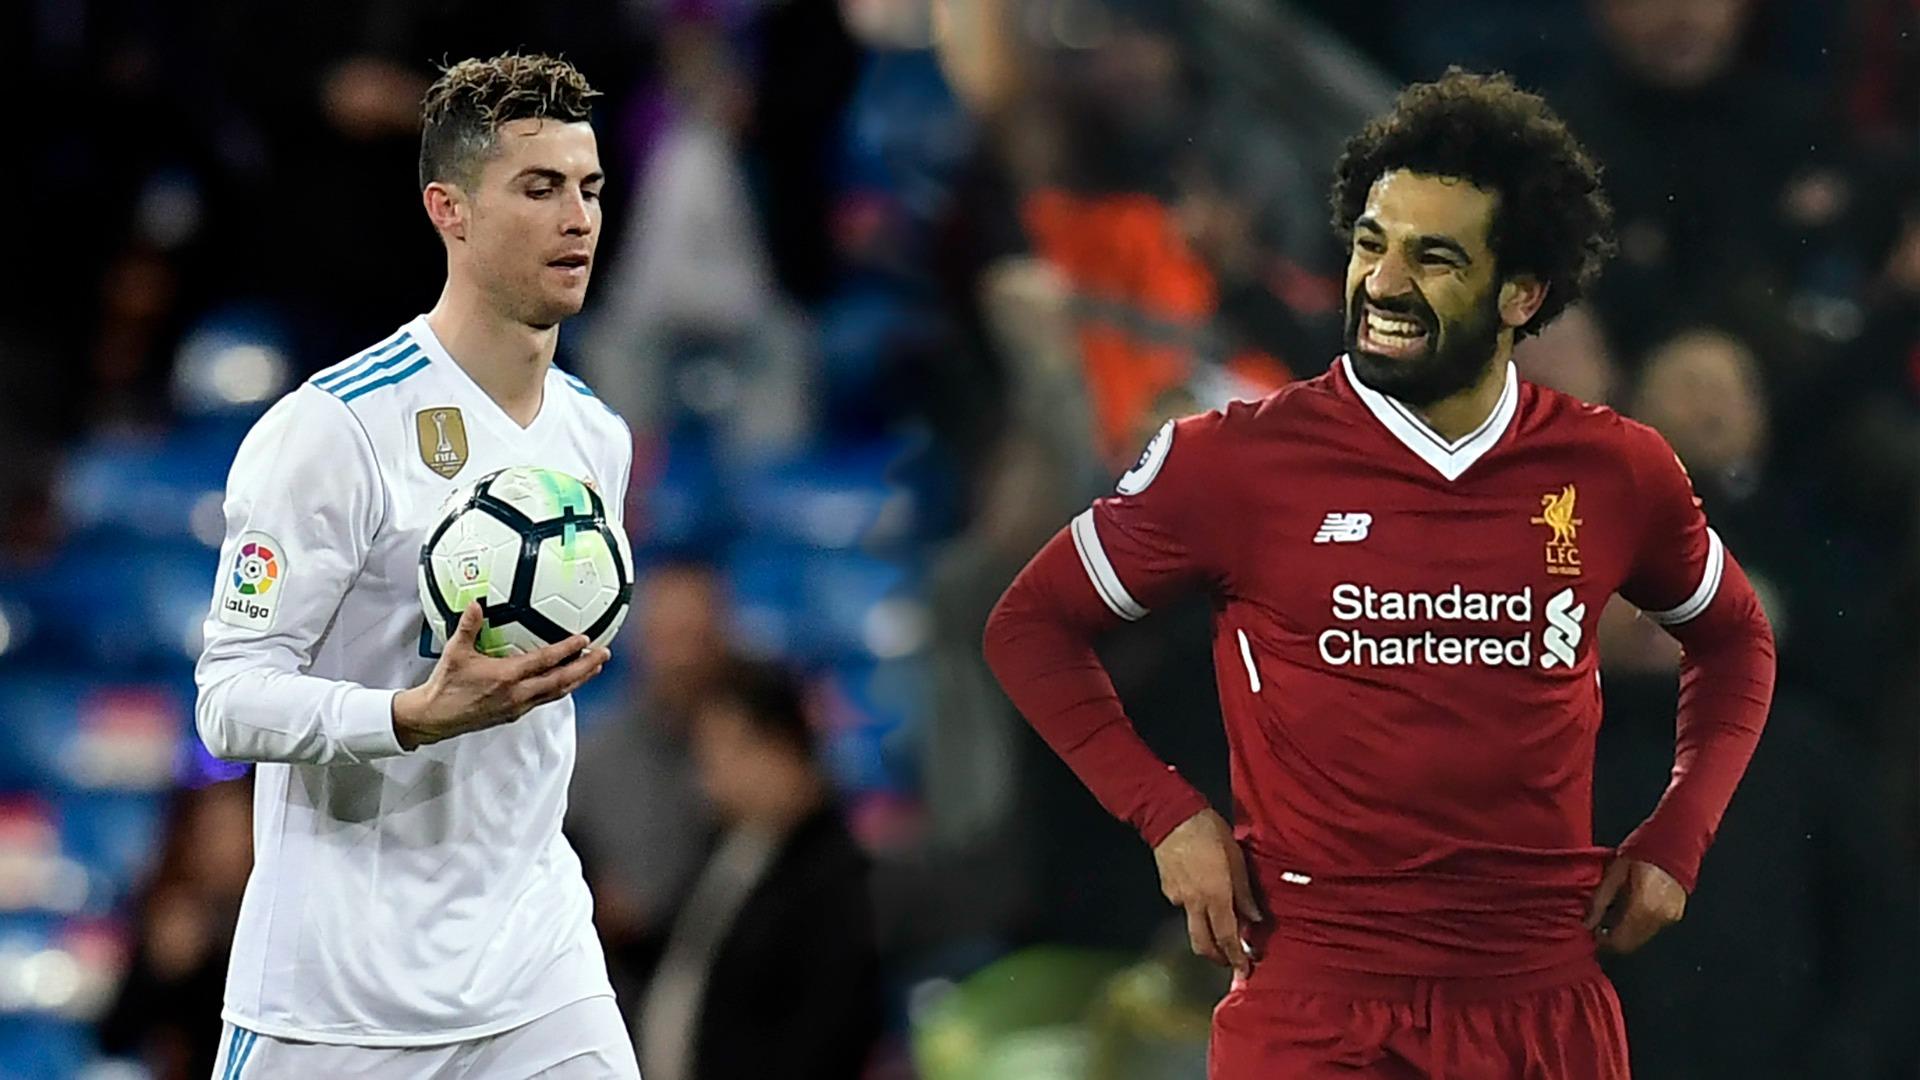 Real Madrid-Liverpool 3-1: magia Bale, papere Karius, i Blancos vincono la tredicesima